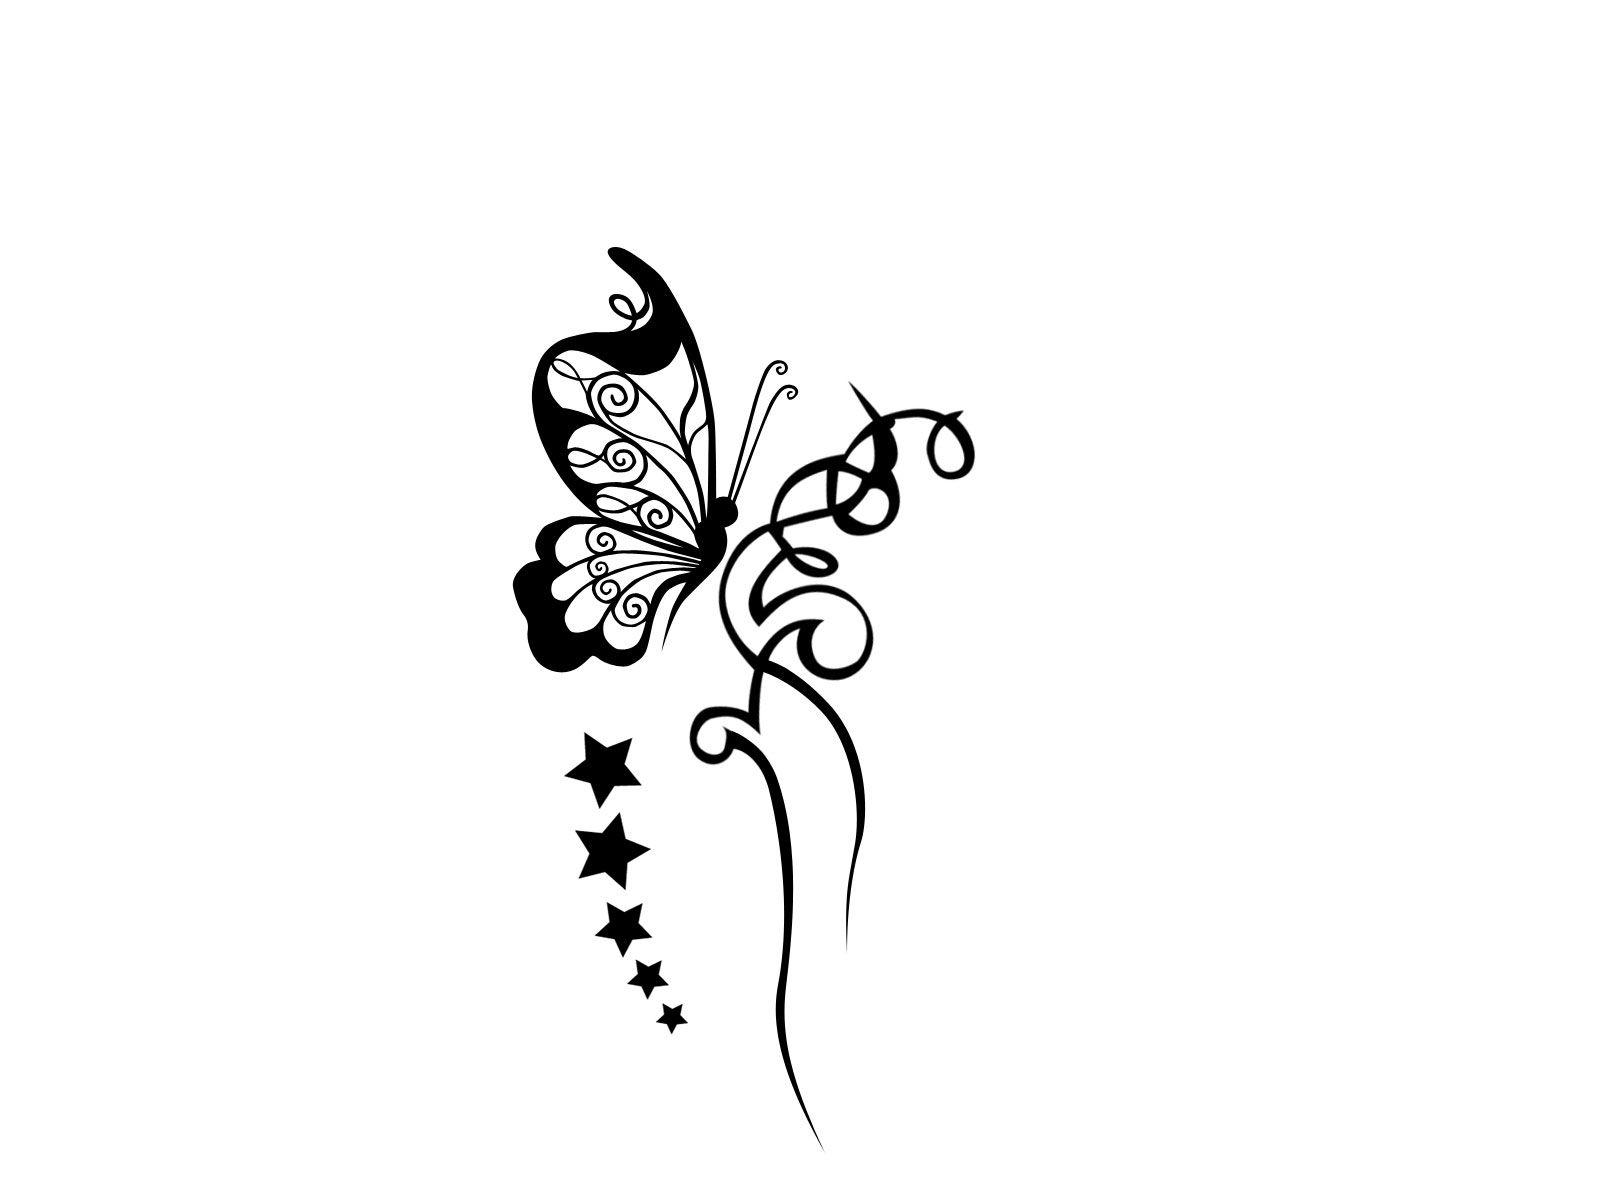 Butterfly star tattoo designs - Butterfly Tattoo Ideas Pinterest 1